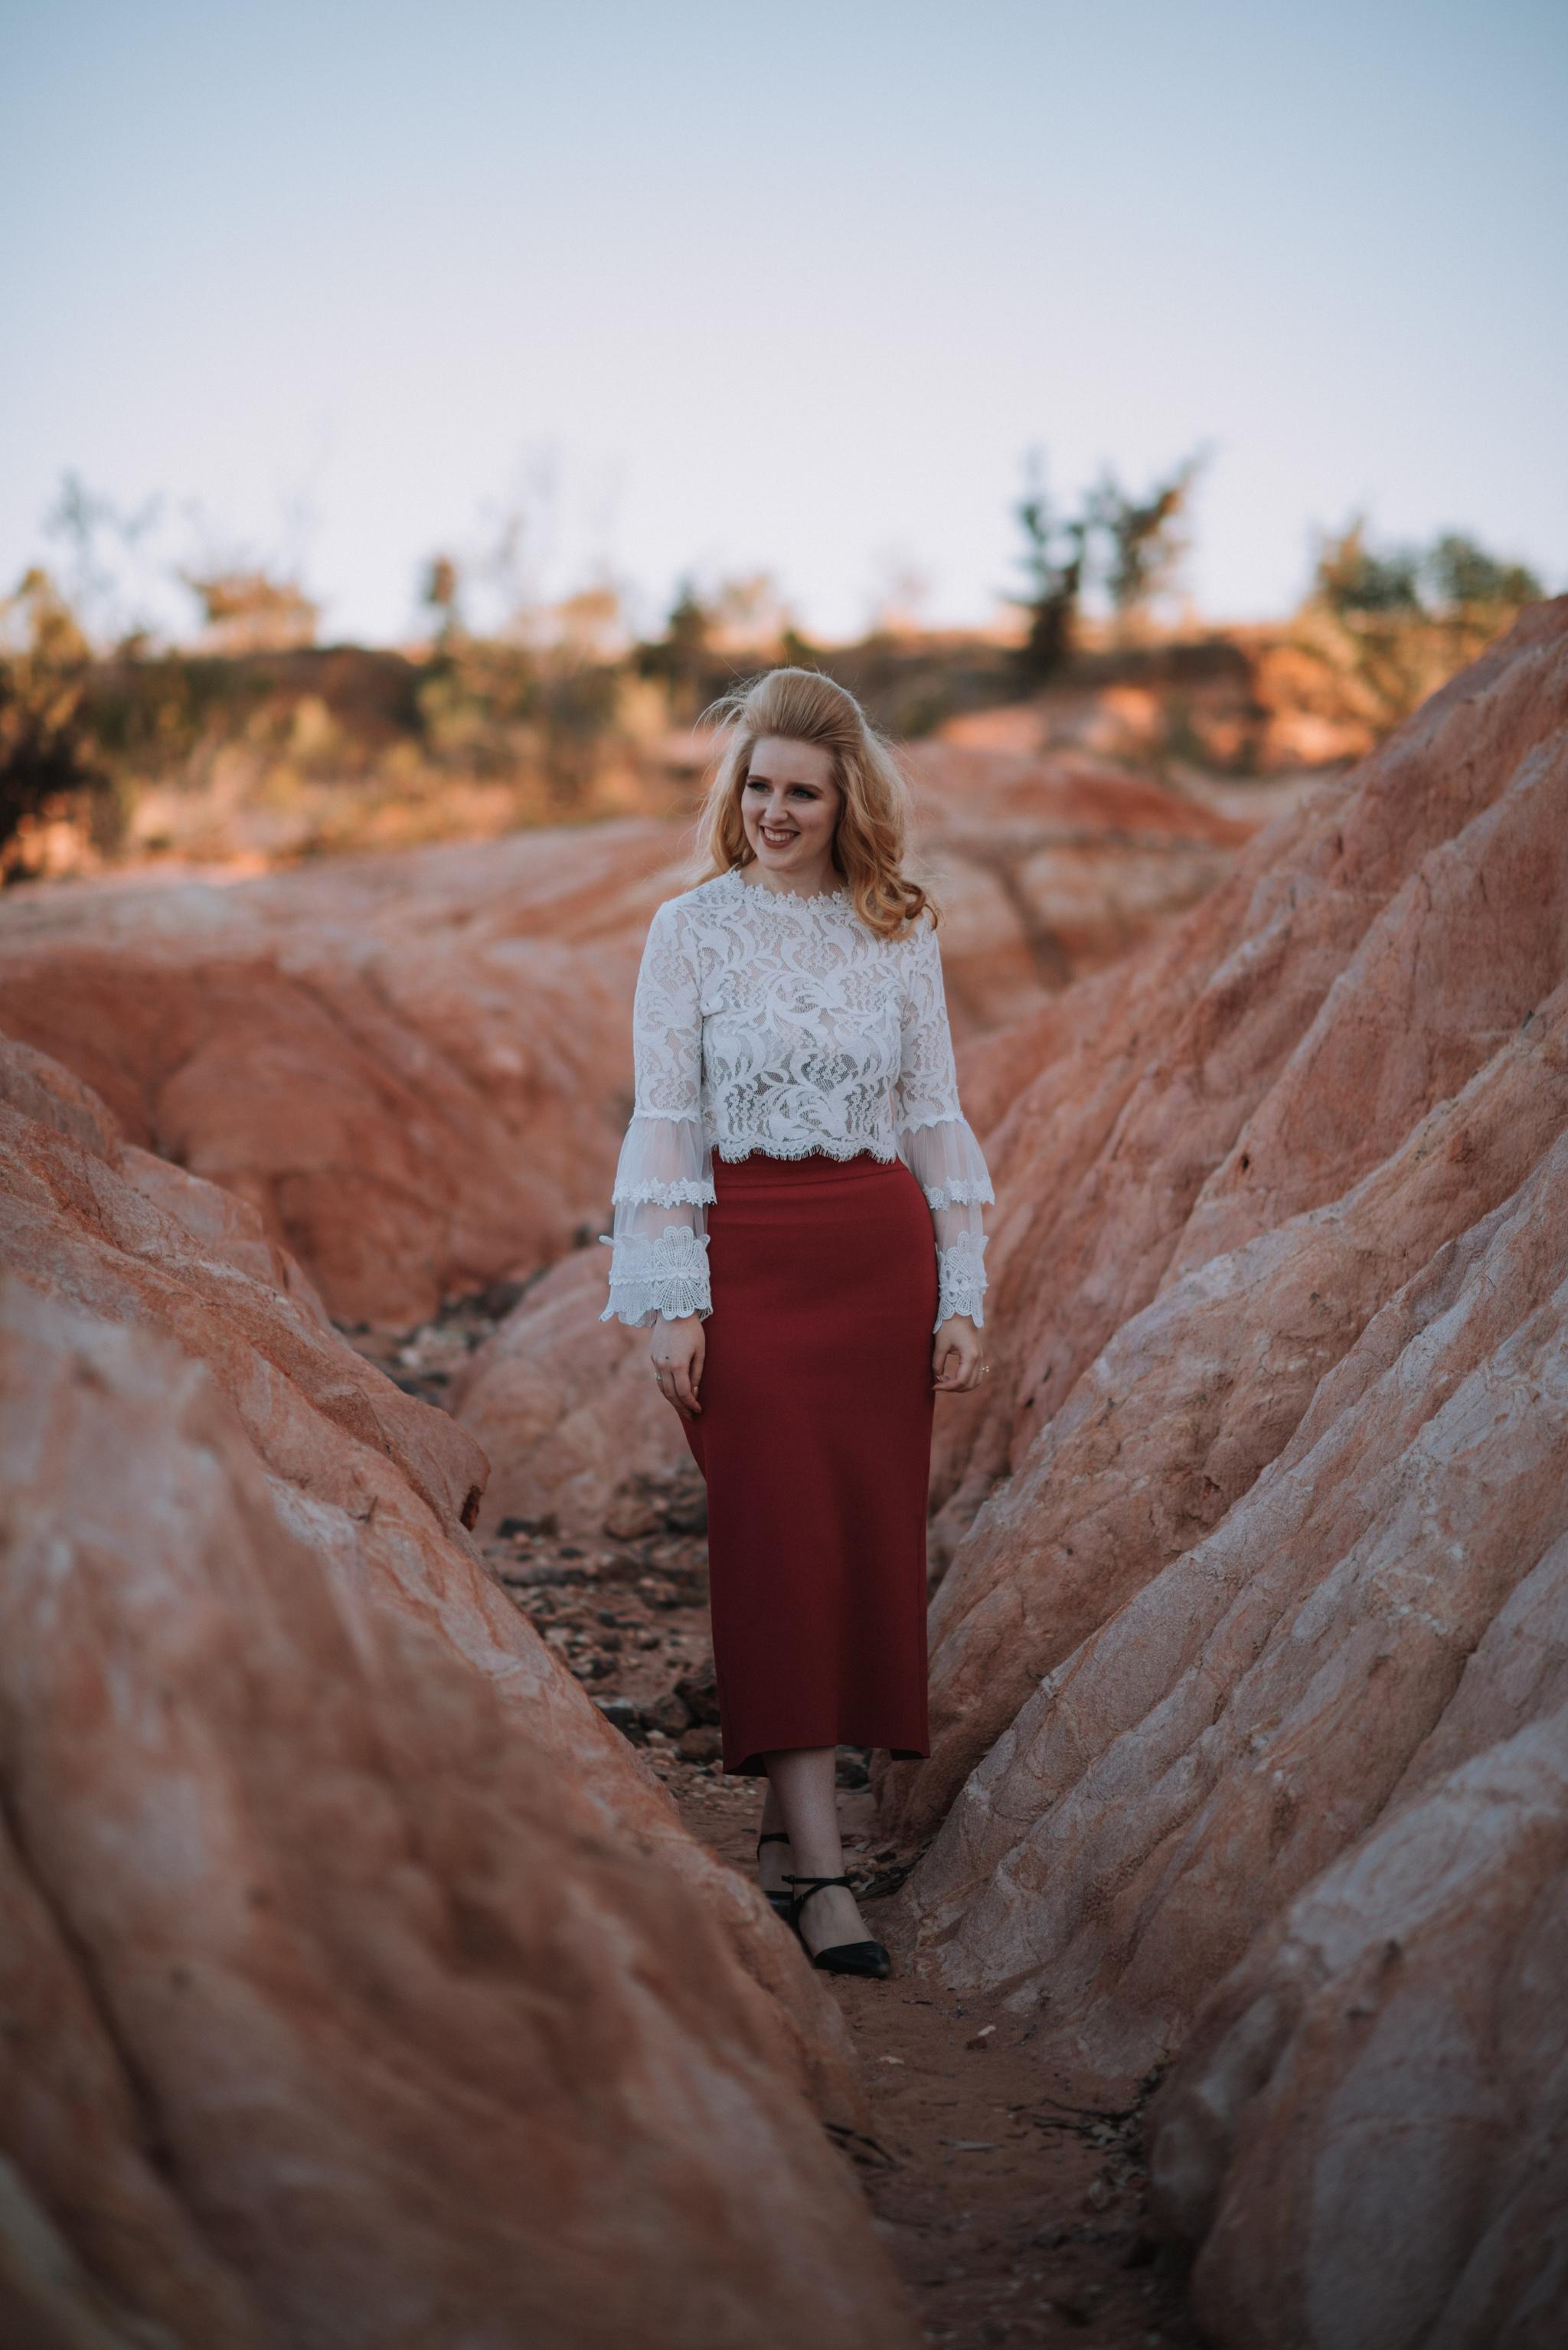 LOVELENSCAPES PHOTOGRAPHY • VISUAL POETRY • MELBOURNE WEDDING PHOTOGRAPHER • ALANNAH HILL DRESS • SUNSET ENGAGEMENT PHOTOS • PINK CLIFFS HEATHCOTE • FASHION EDITORIAL PHOTOGRAPHER • 1.jpg